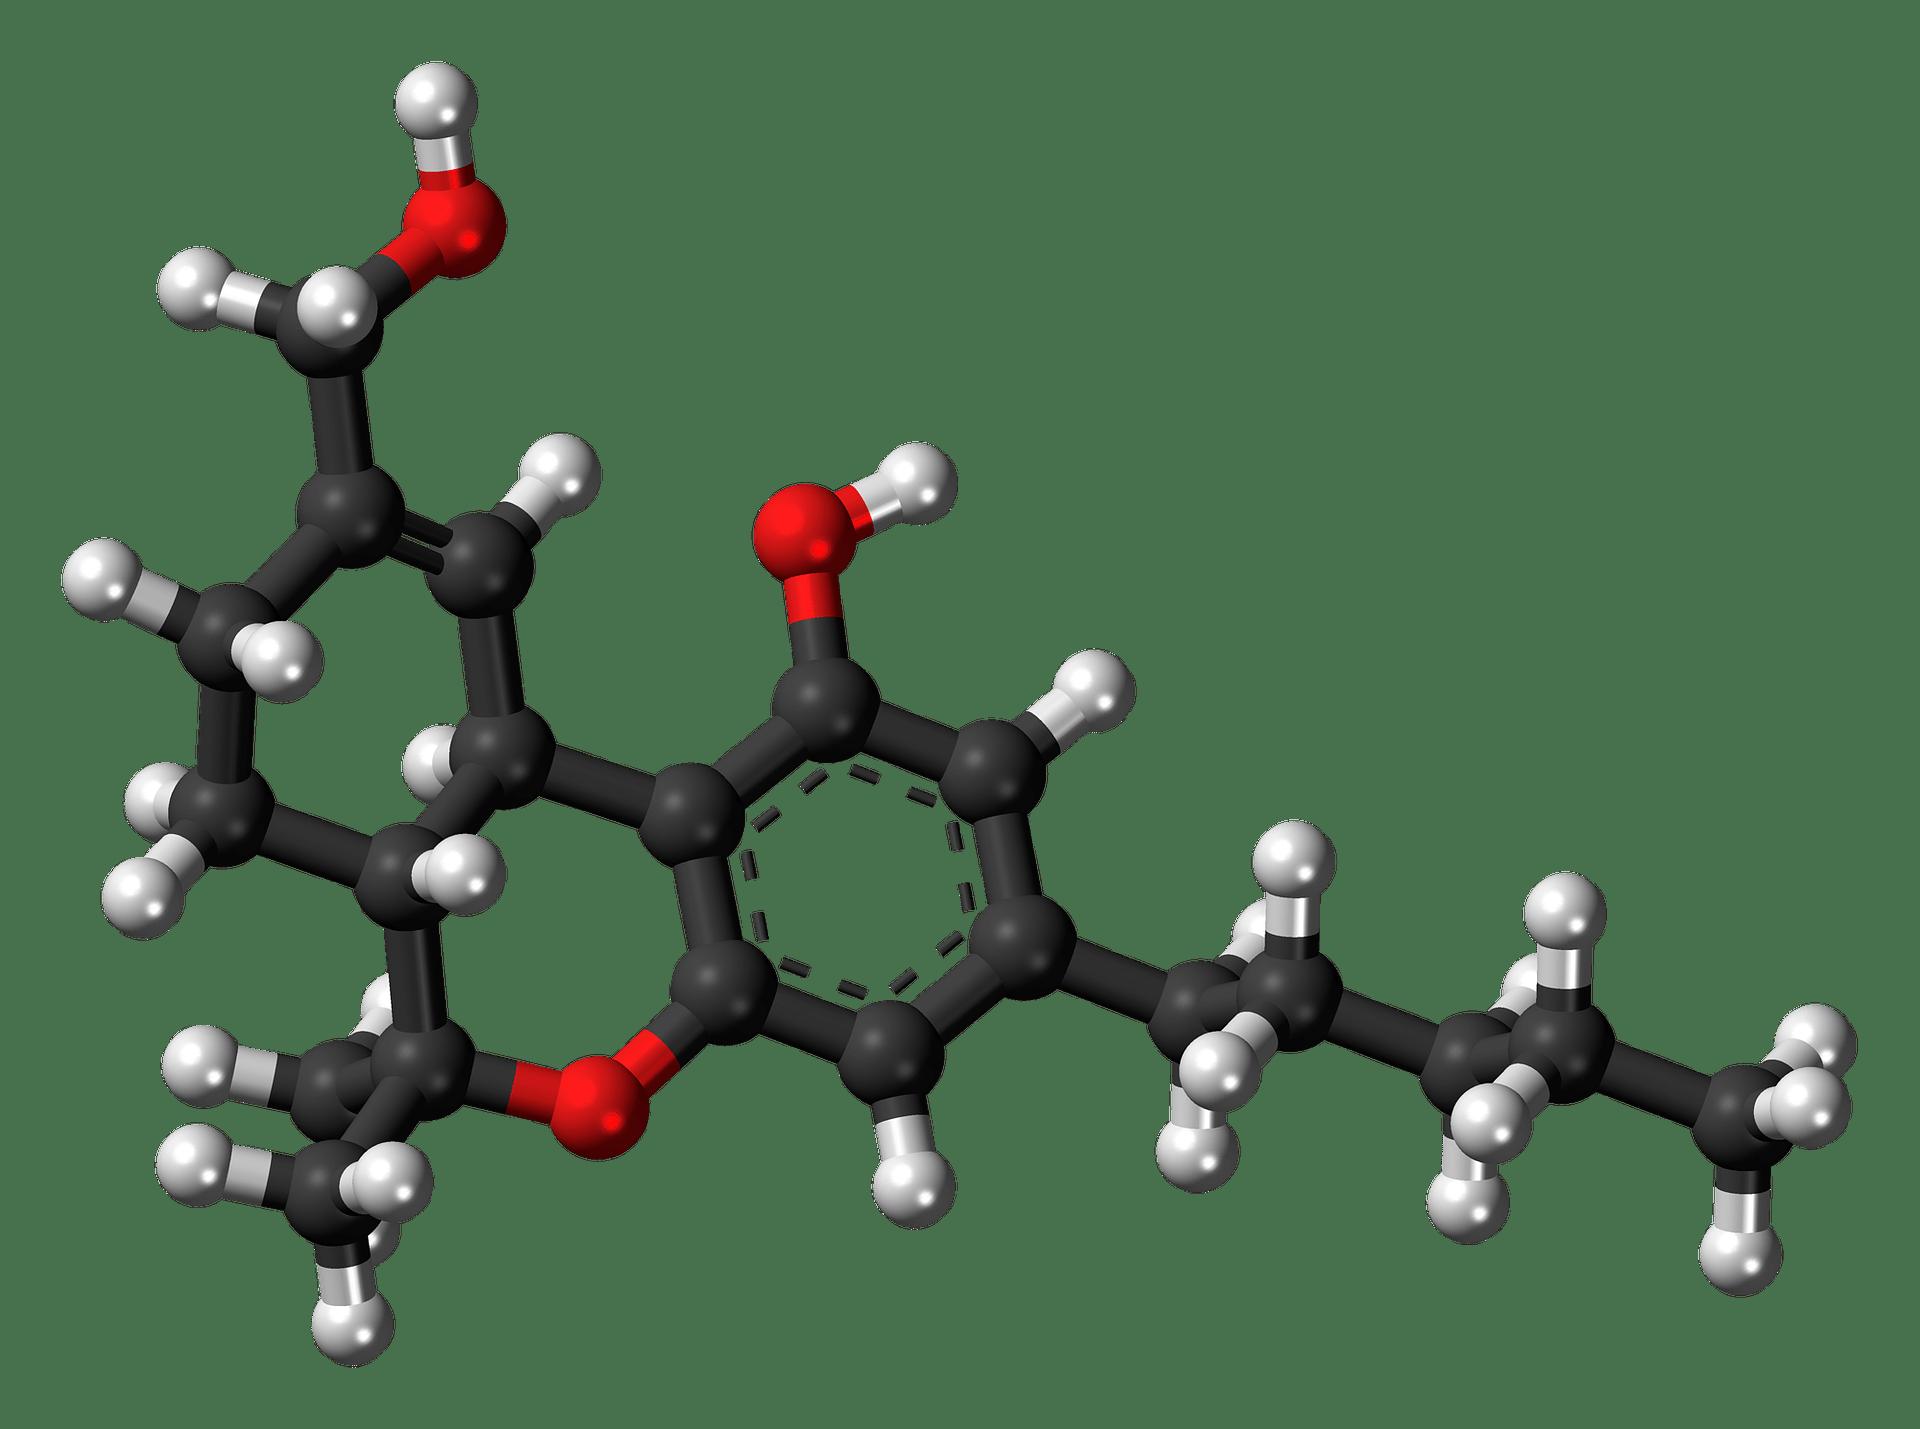 The Difference Between Delta 8 and Delta 9 Tetrahydrocannabinol